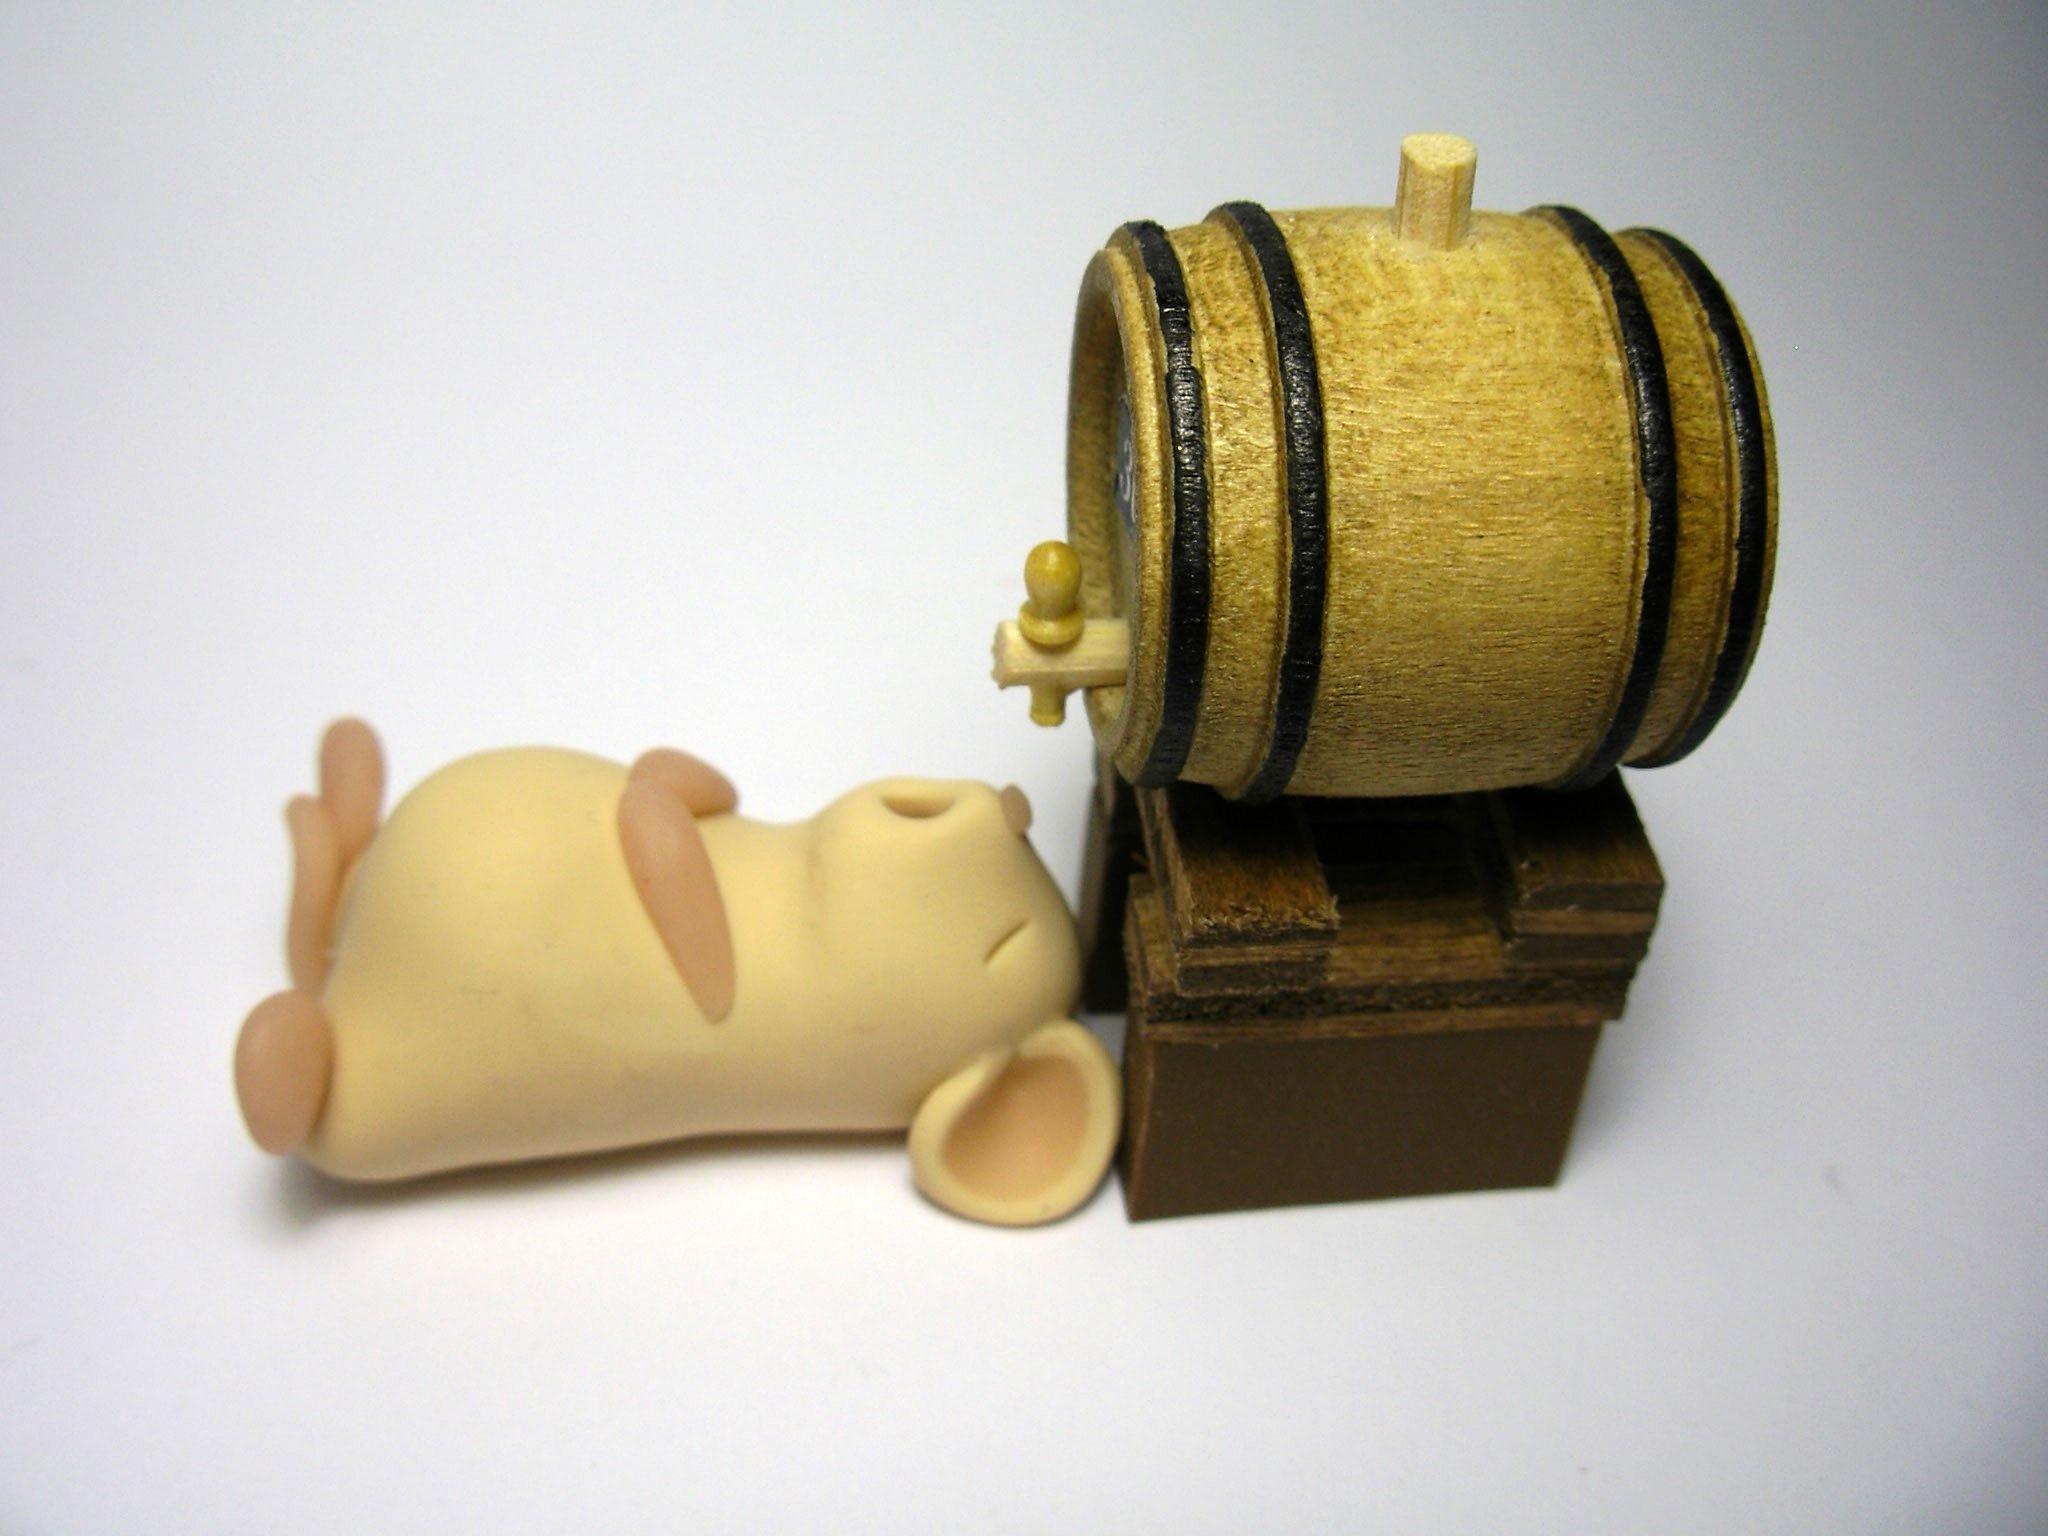 Фото: Мышь и бочка пива.